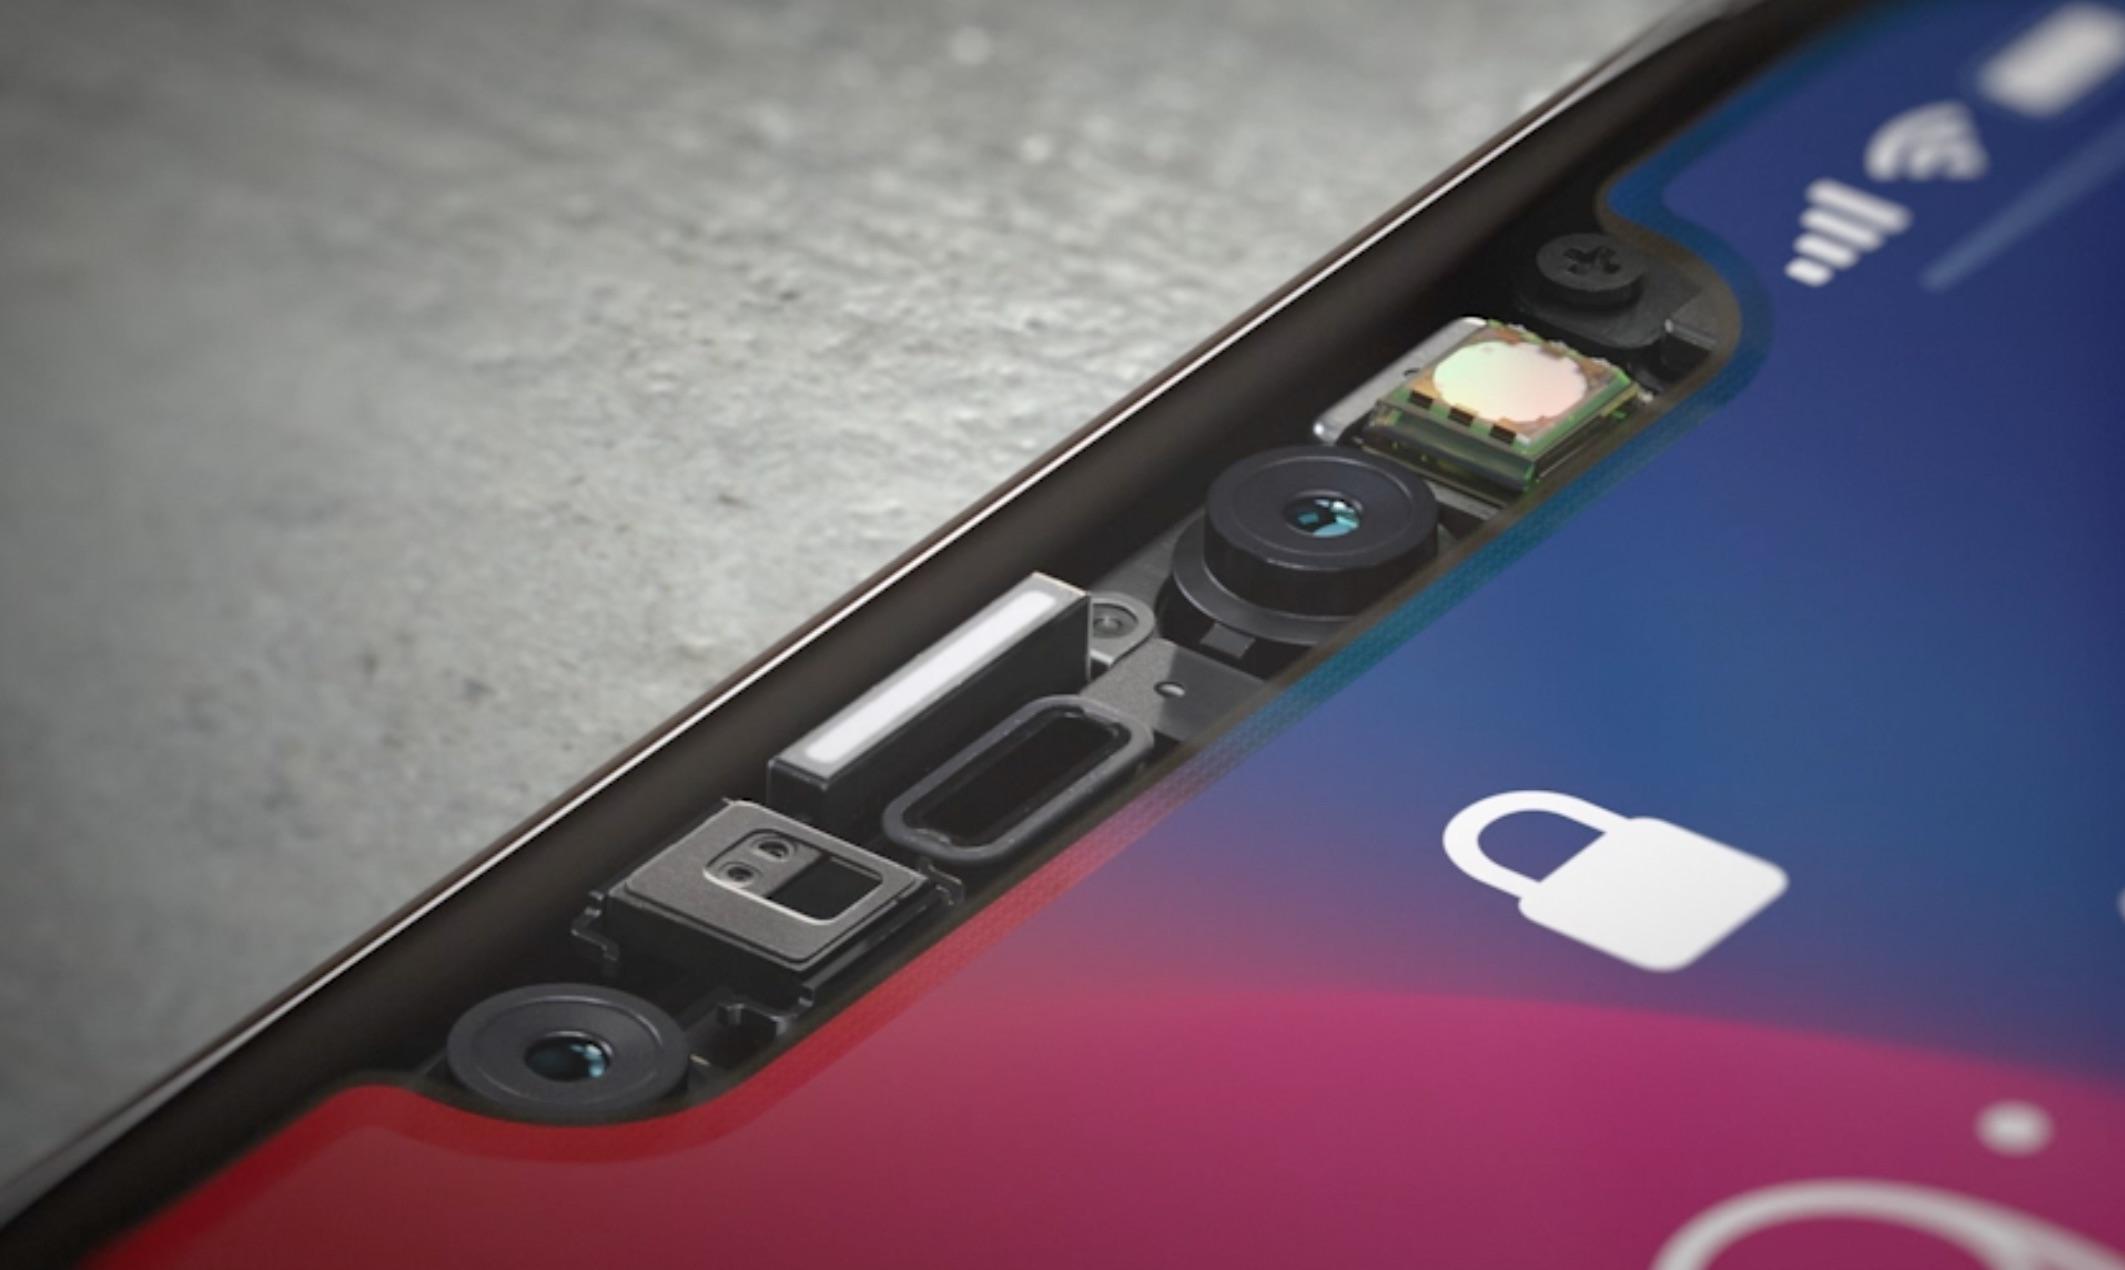 L'iPhone X ha il miglior display su smartphone: lo afferma DisplayMate